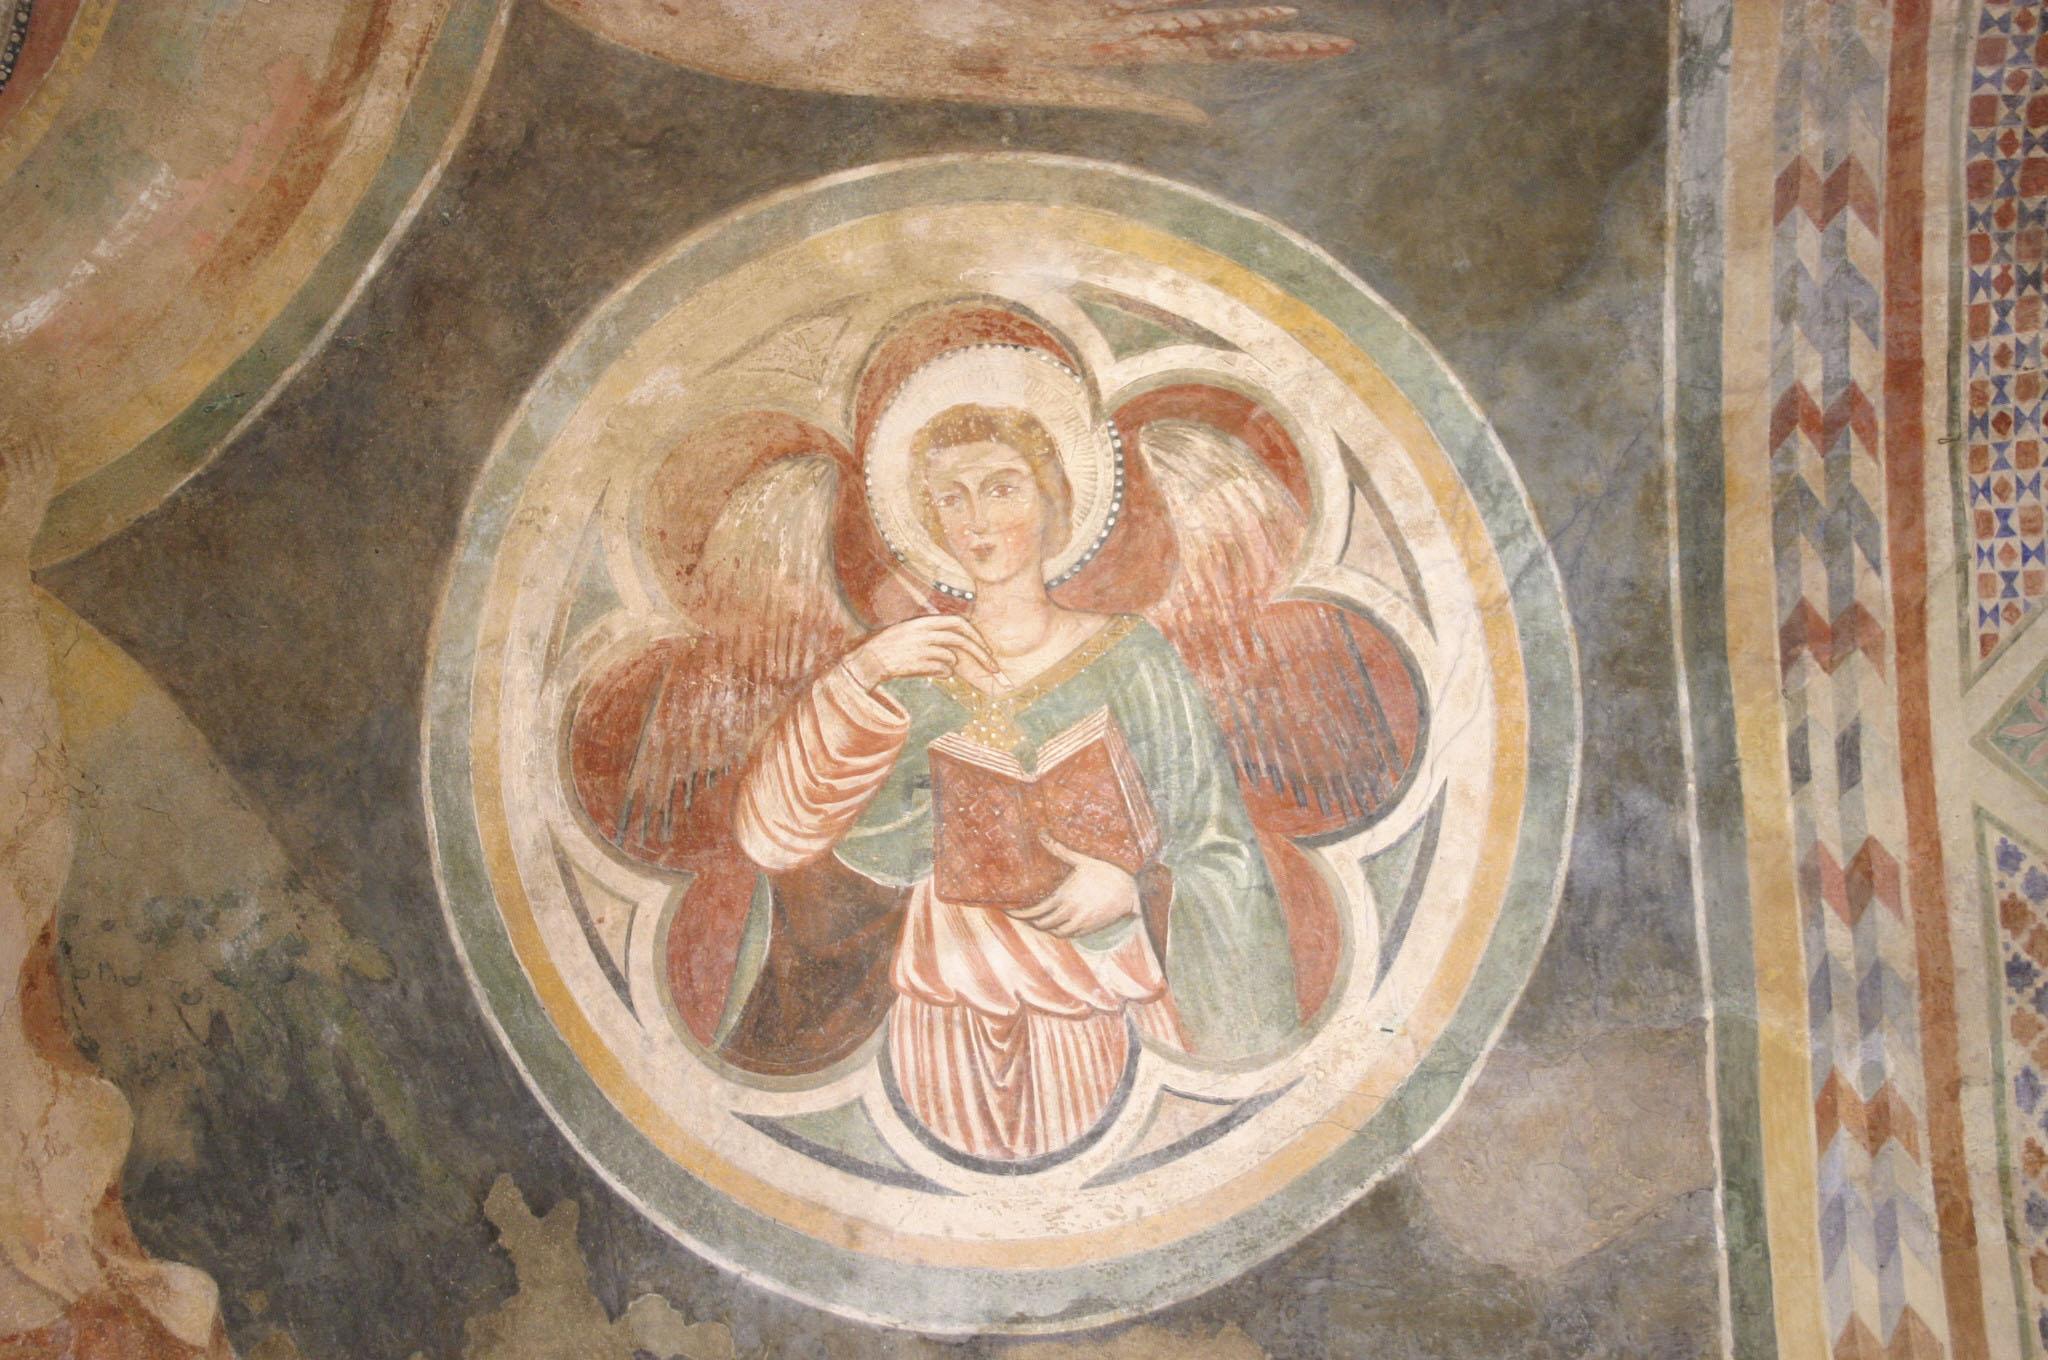 Affreschi nella cripta di San Francesco - San Matteo. 1370-73